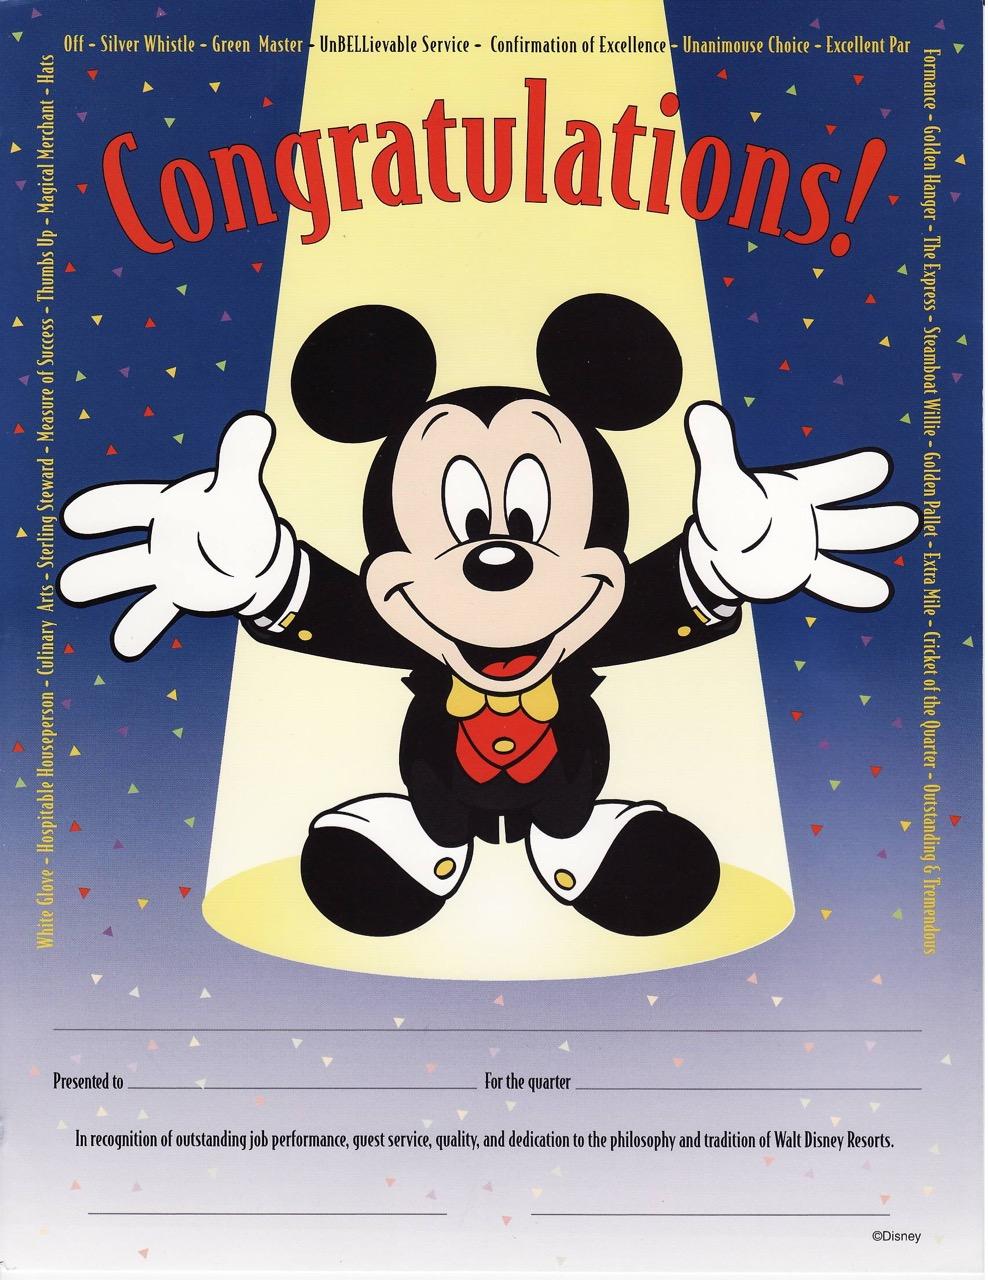 Reward & Recognition at the Walt Disney World Resort.